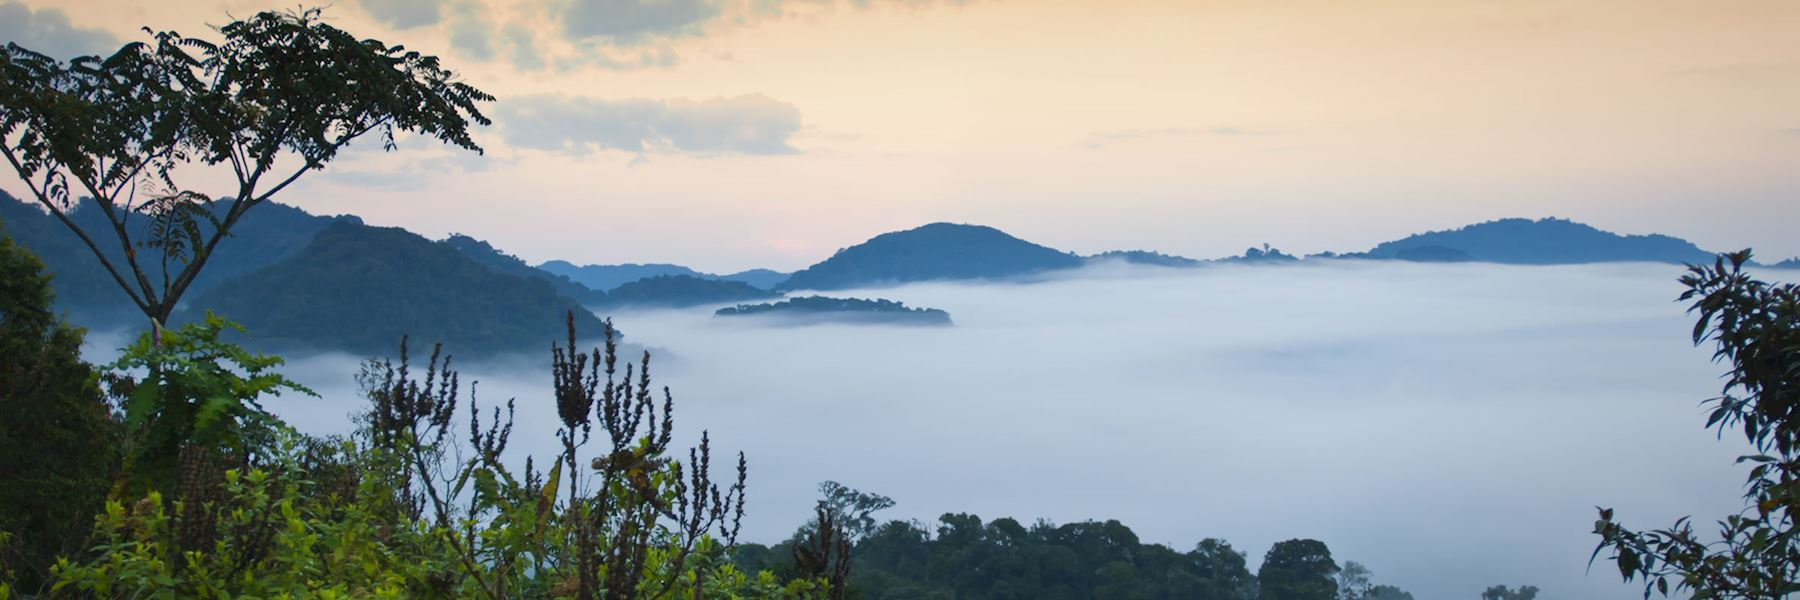 Rwanda vacations and safaris